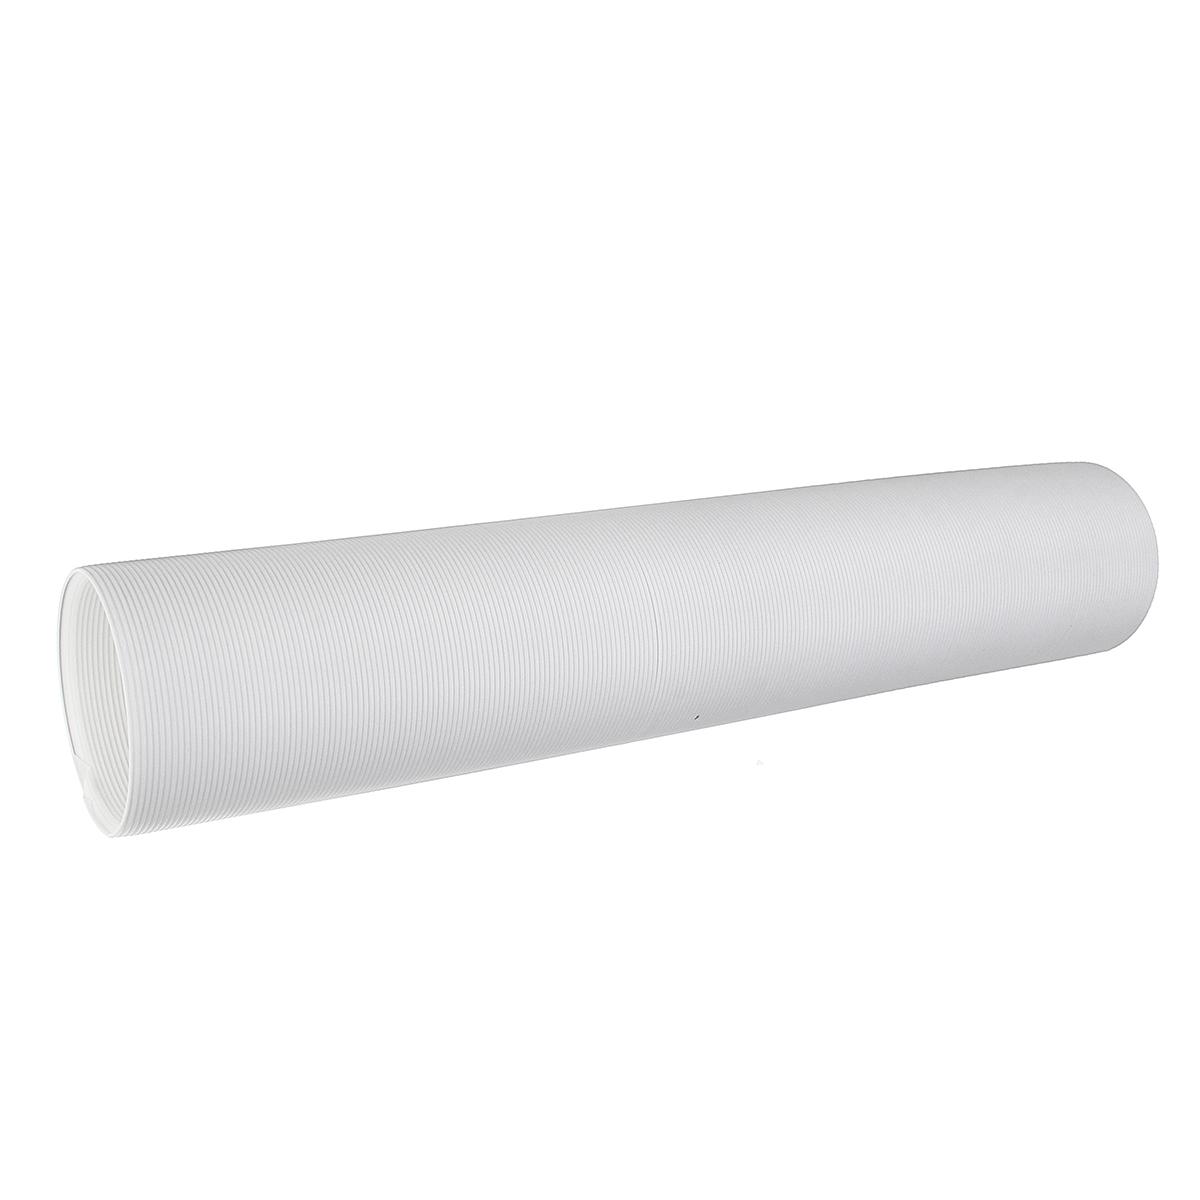 2M/3M Flexible Exhaust Hose Tube Mobile Air Conditioner Window Vent Pipe 13cm  Dia